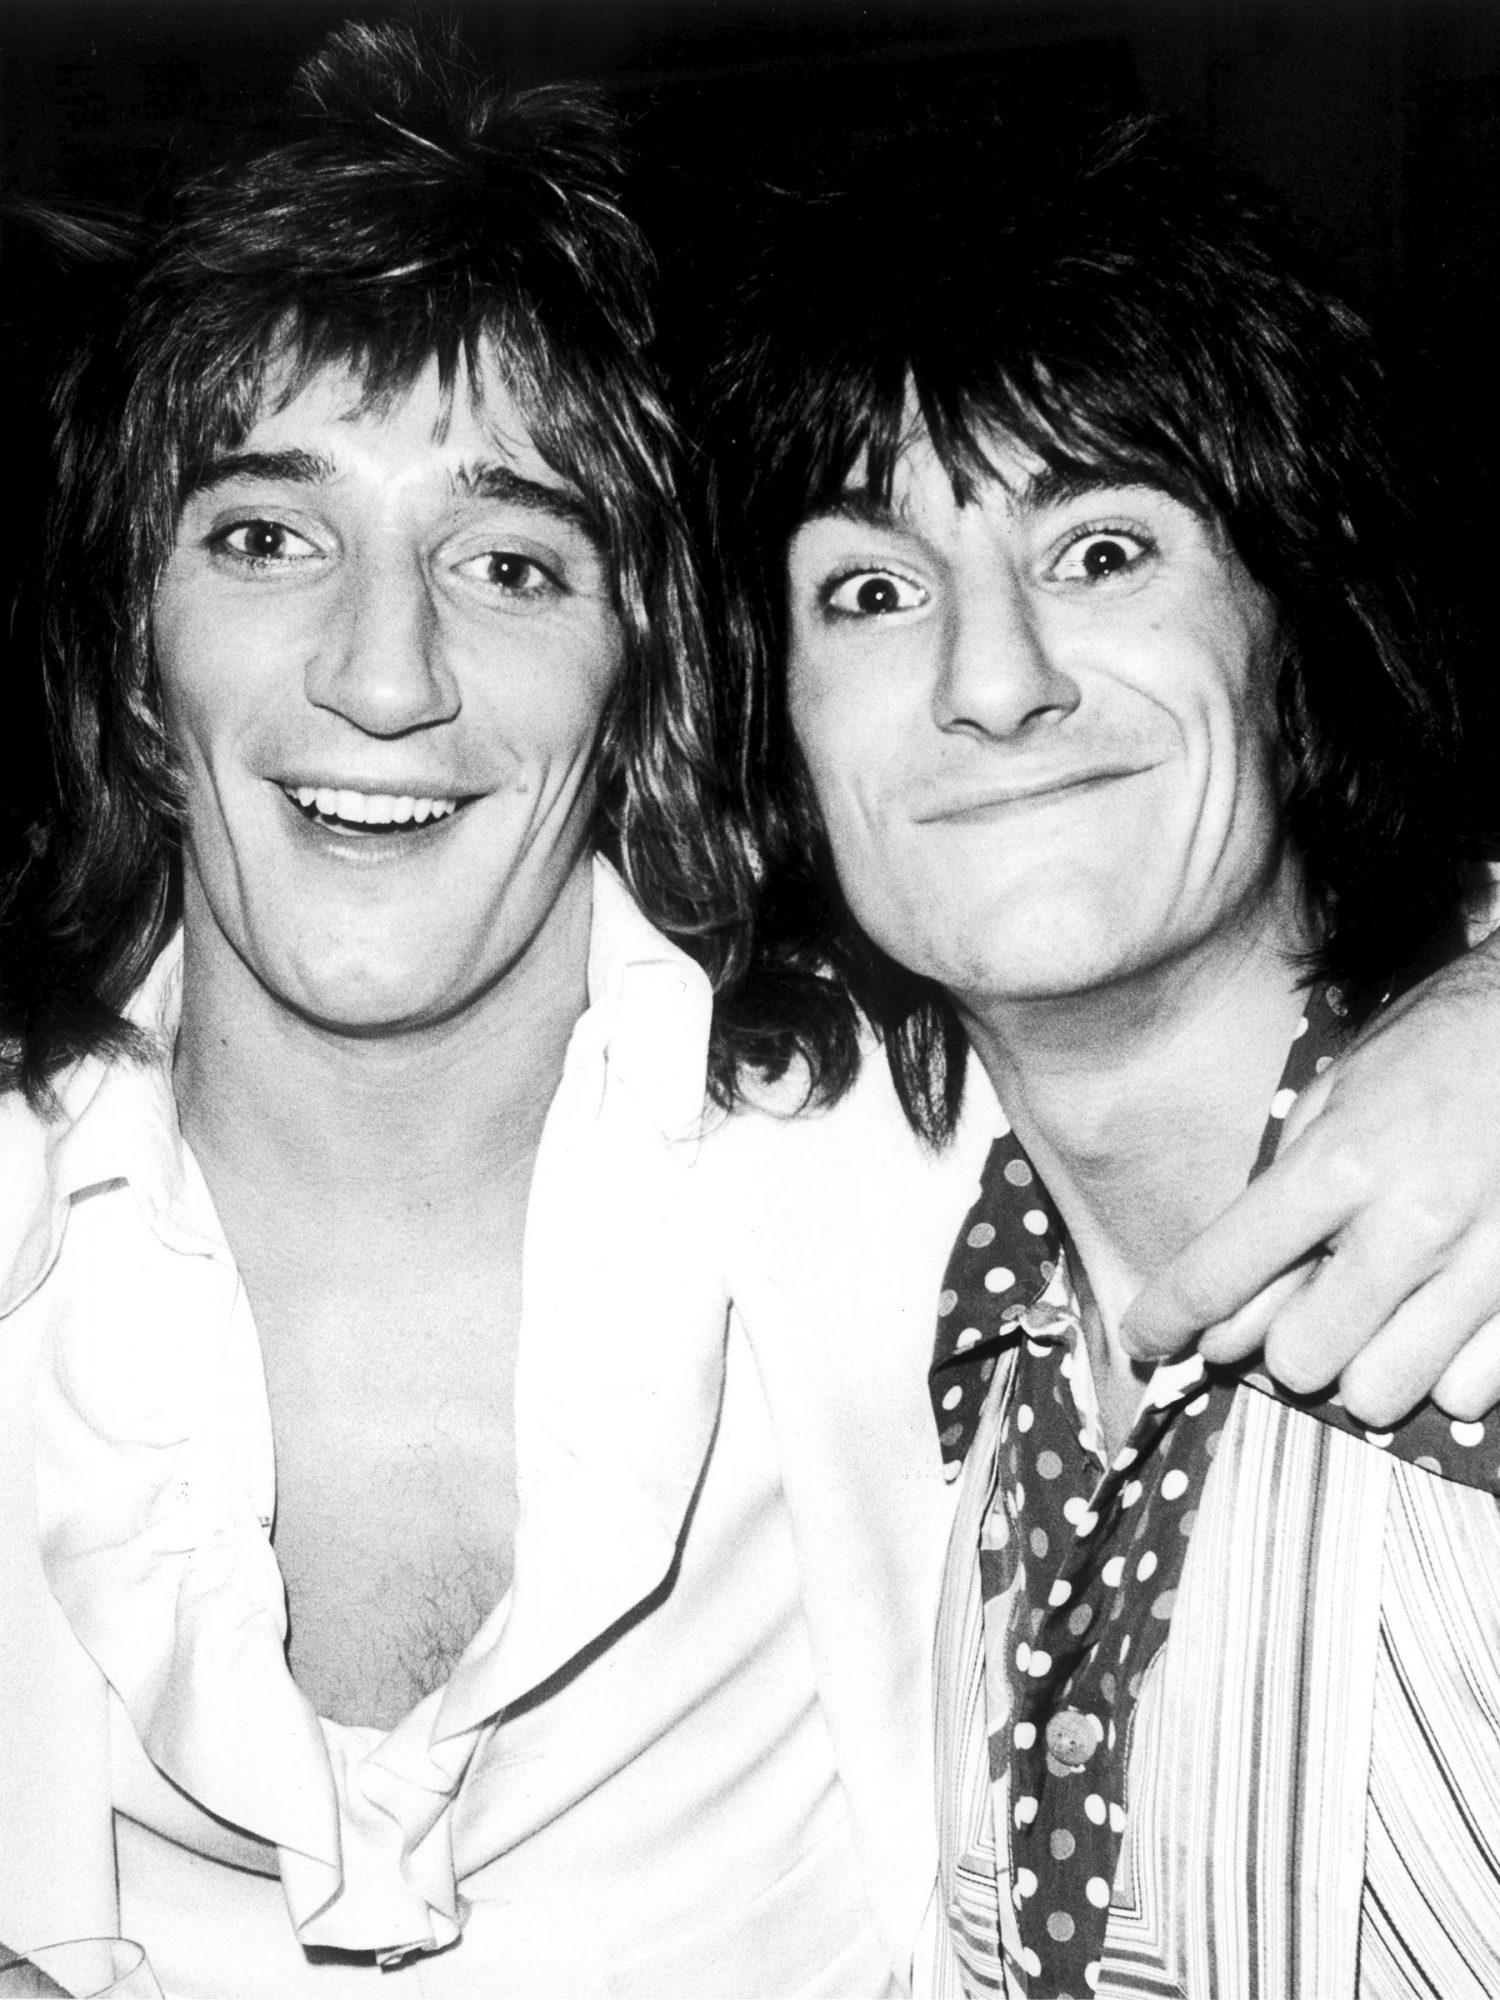 Rod Stewart and Ronnie Wood